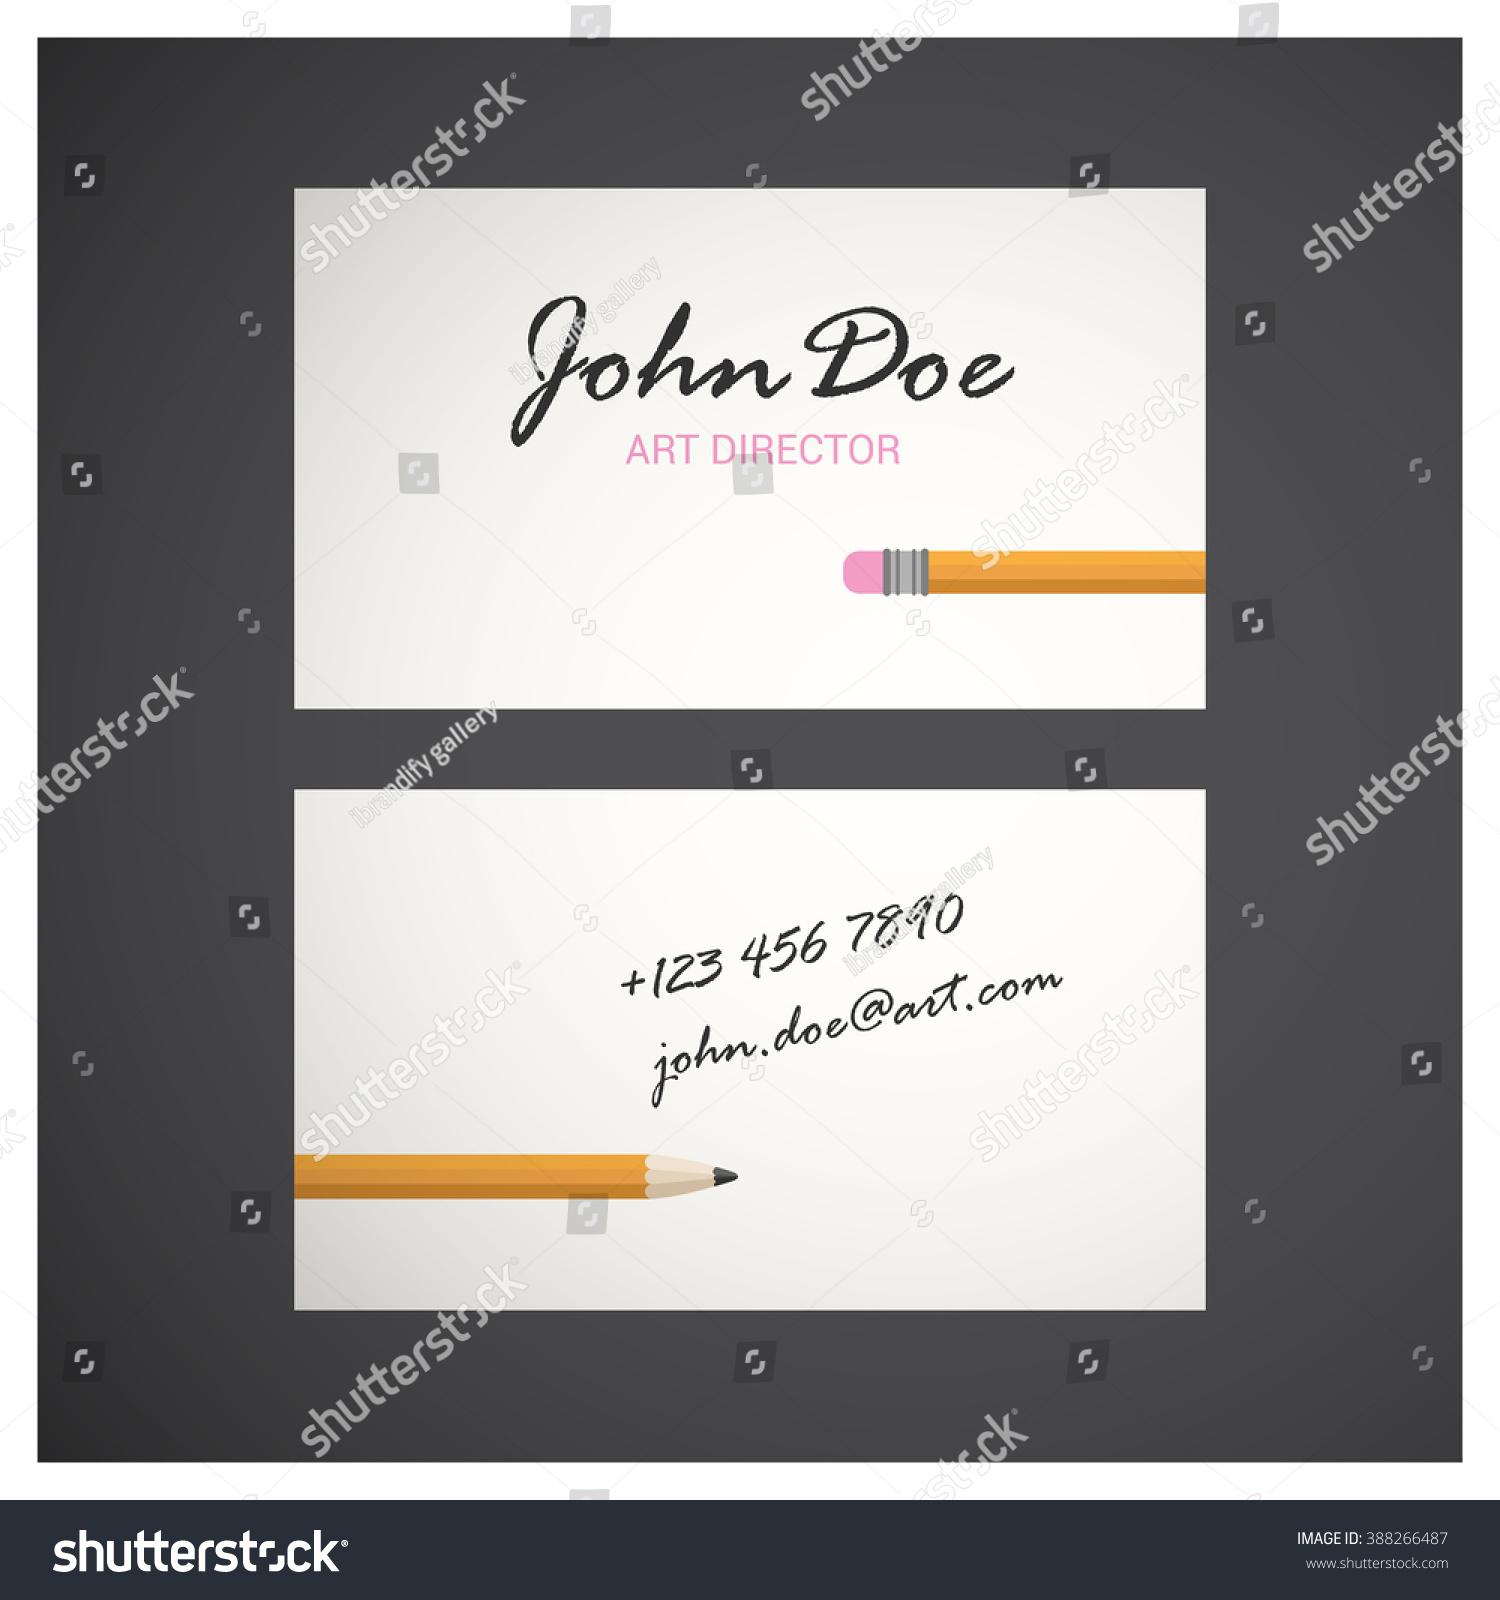 Art Director White Business Card Stock Vector 388266487 - Shutterstock